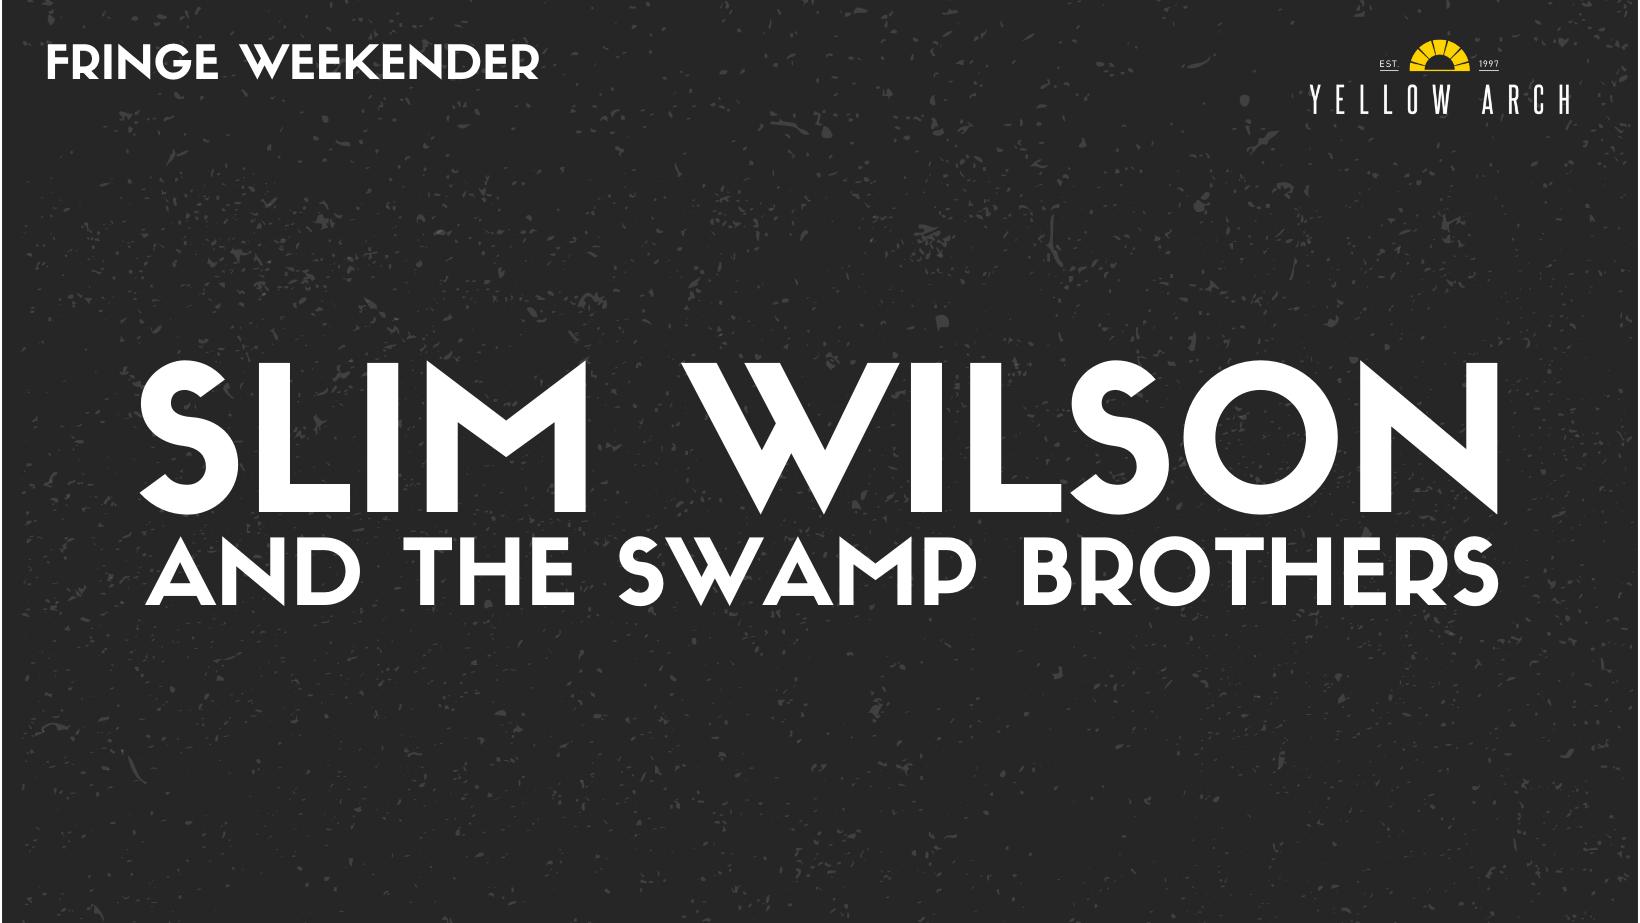 Slim Wilson & The Swamp Brothers